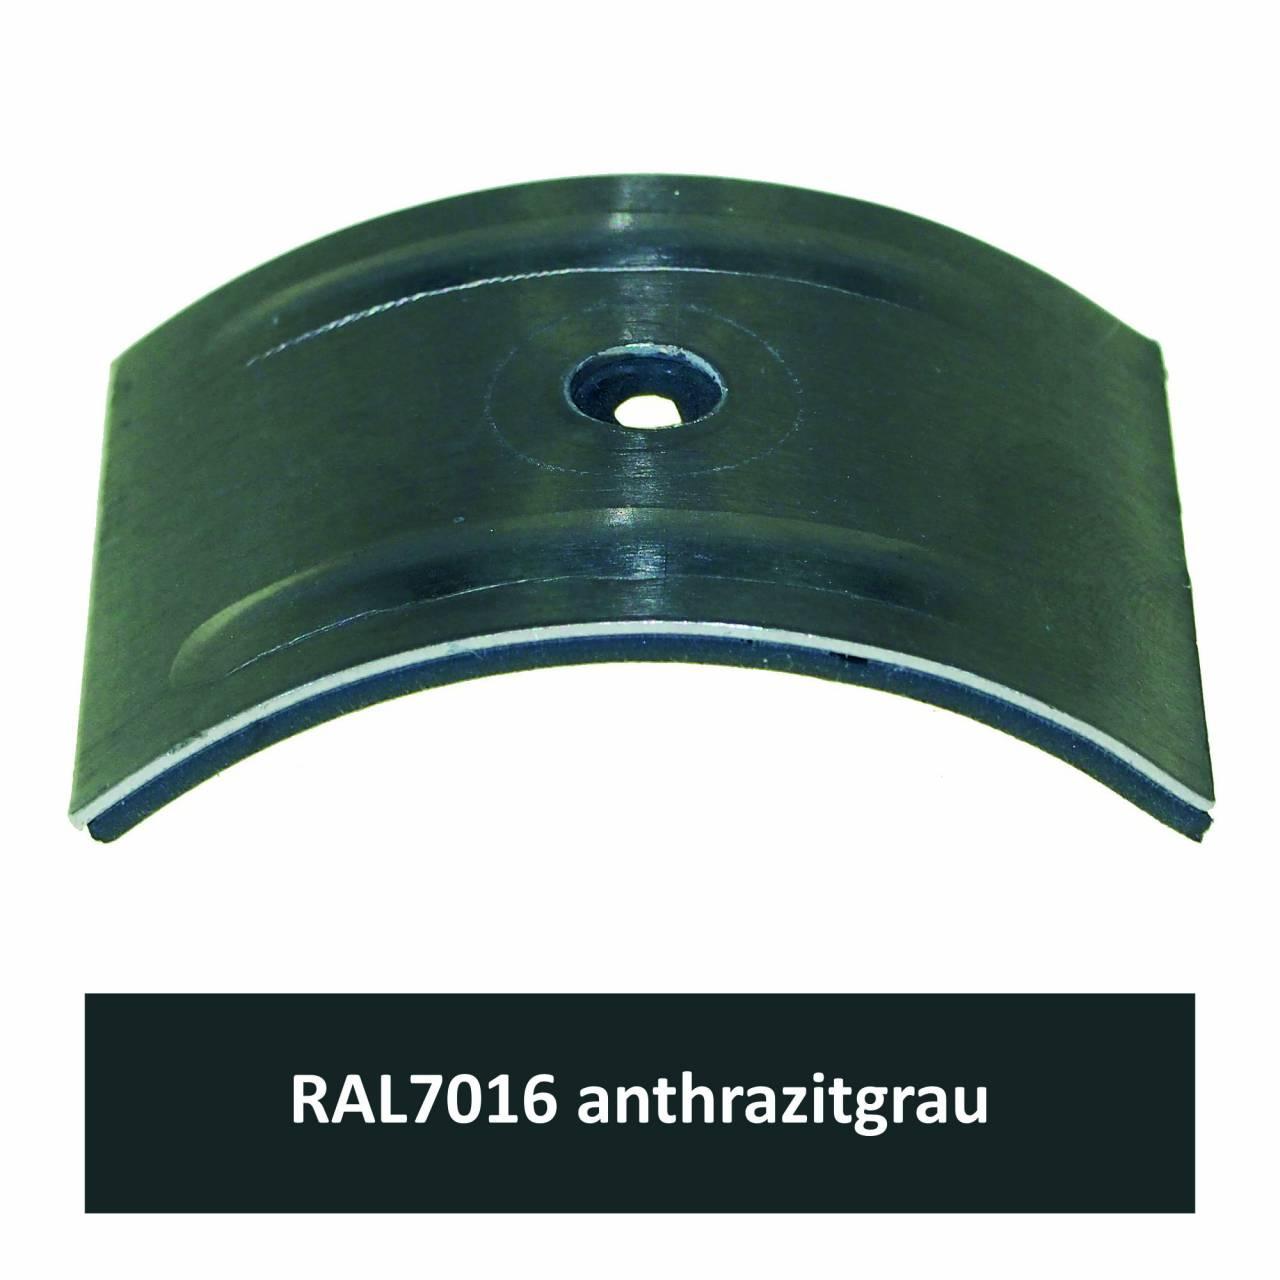 Kalotten für Welle 130/30, Alu RAL7016 anthrazitgrau / Pck a 100 Stück